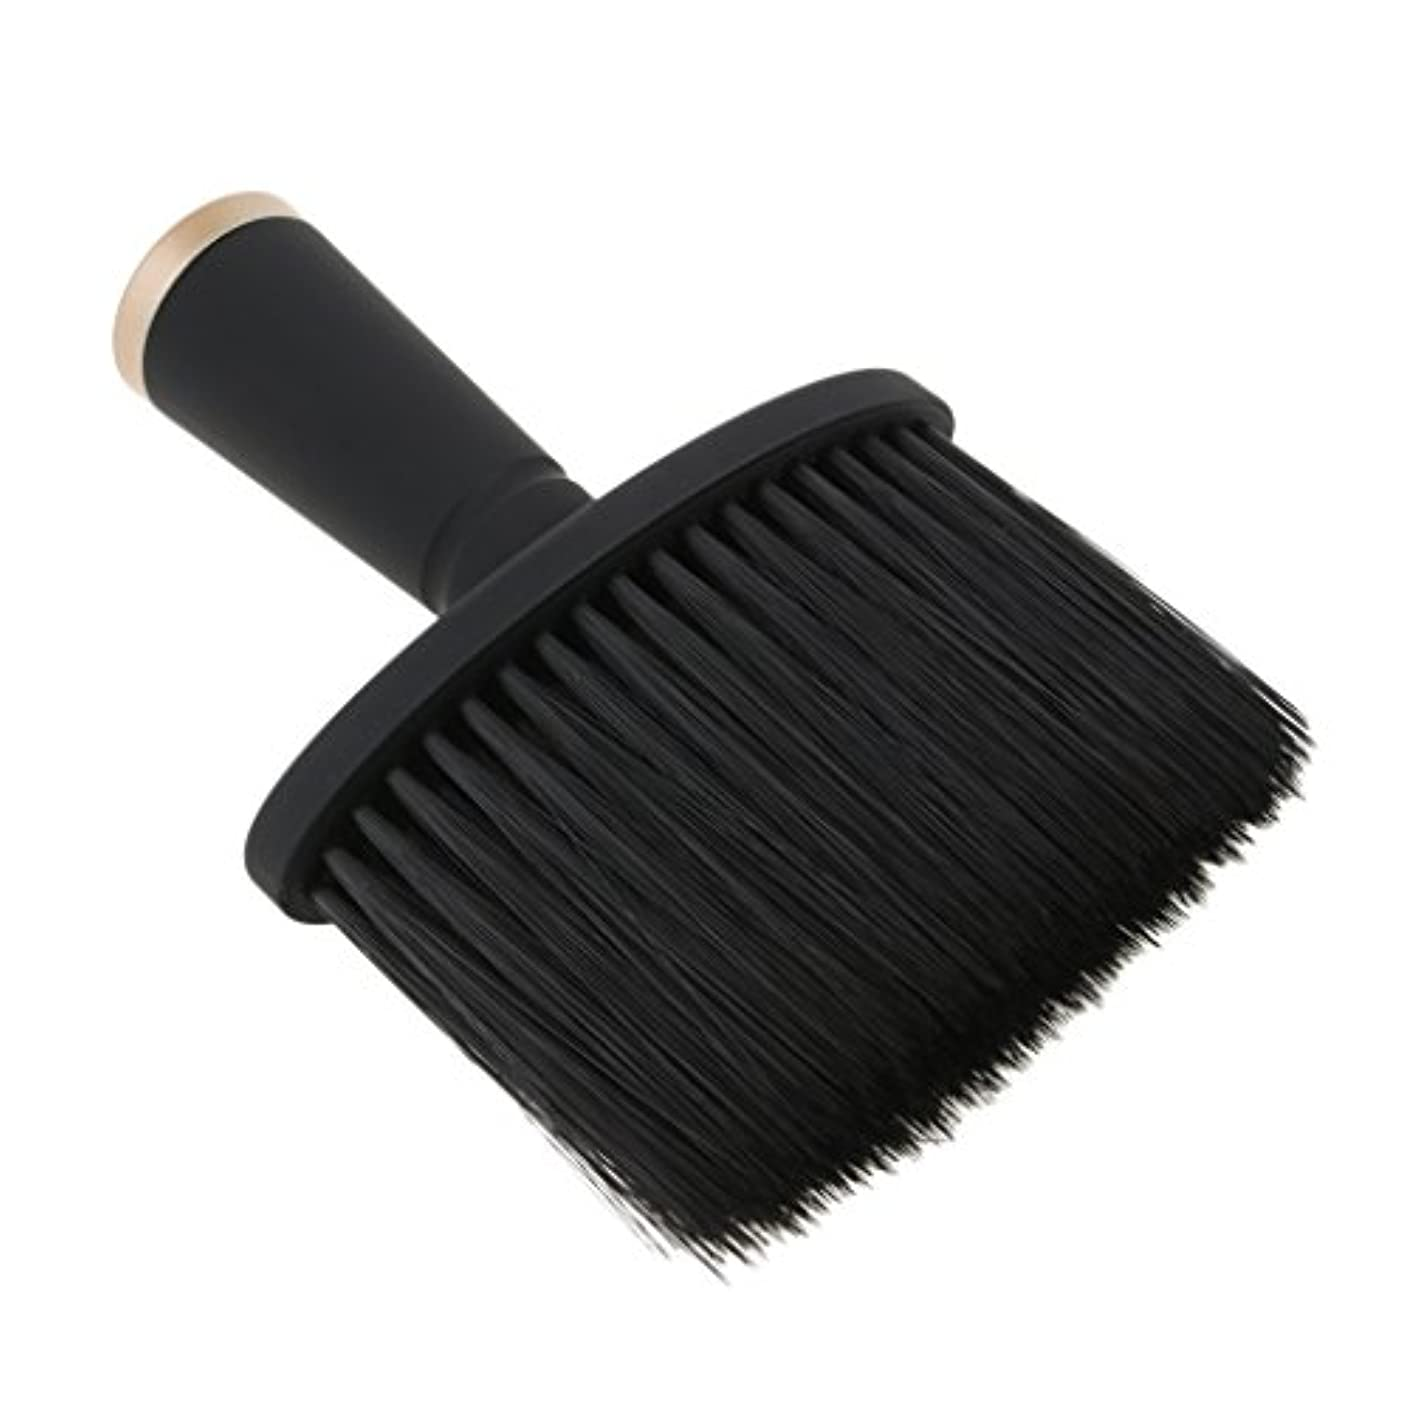 FutuHome 専門の理髪師の首の塵払いのブラシ、毛の切断のための柔らかいクリーニングの表面ブラシ、携帯用設計 - ゴールド